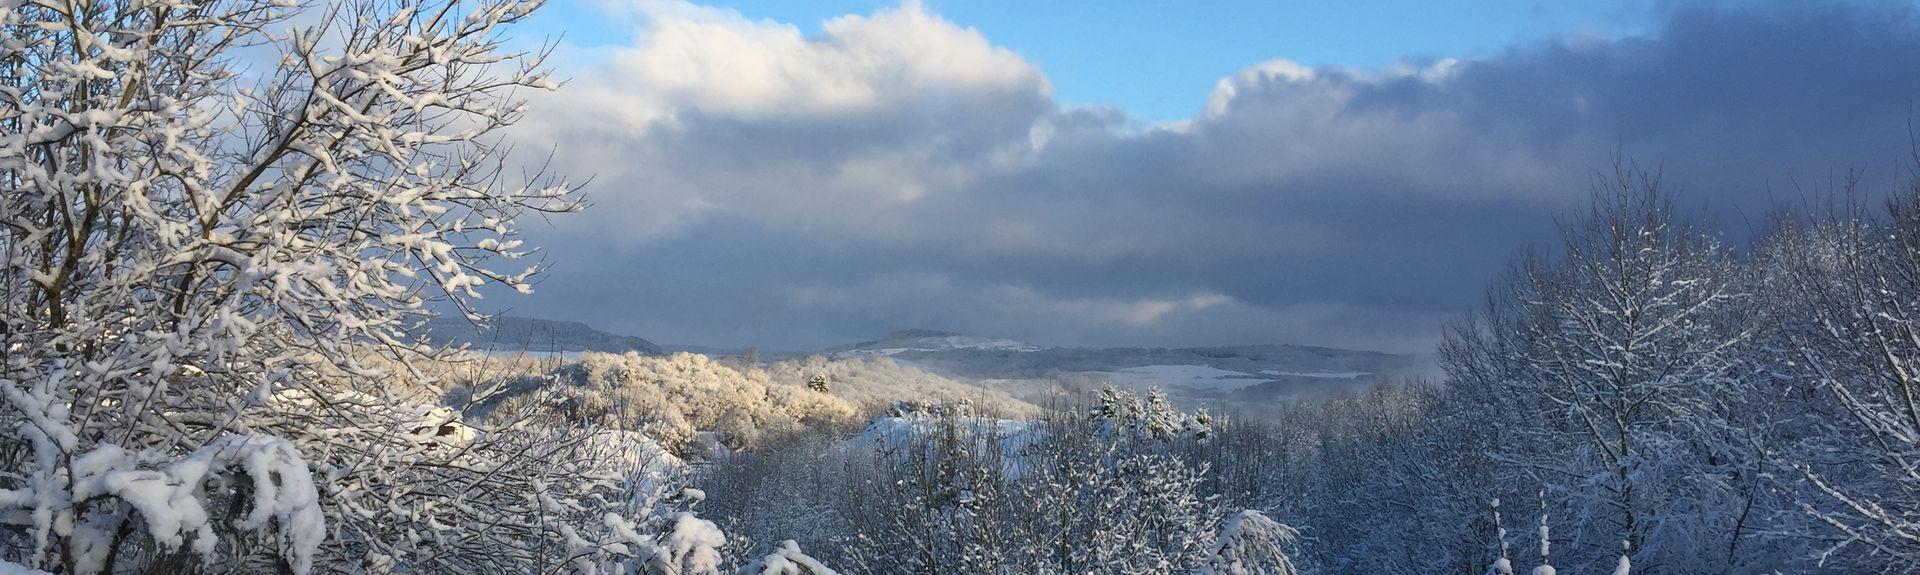 Oberstadtfeld, Rhineland-Palatinate, Allemagne